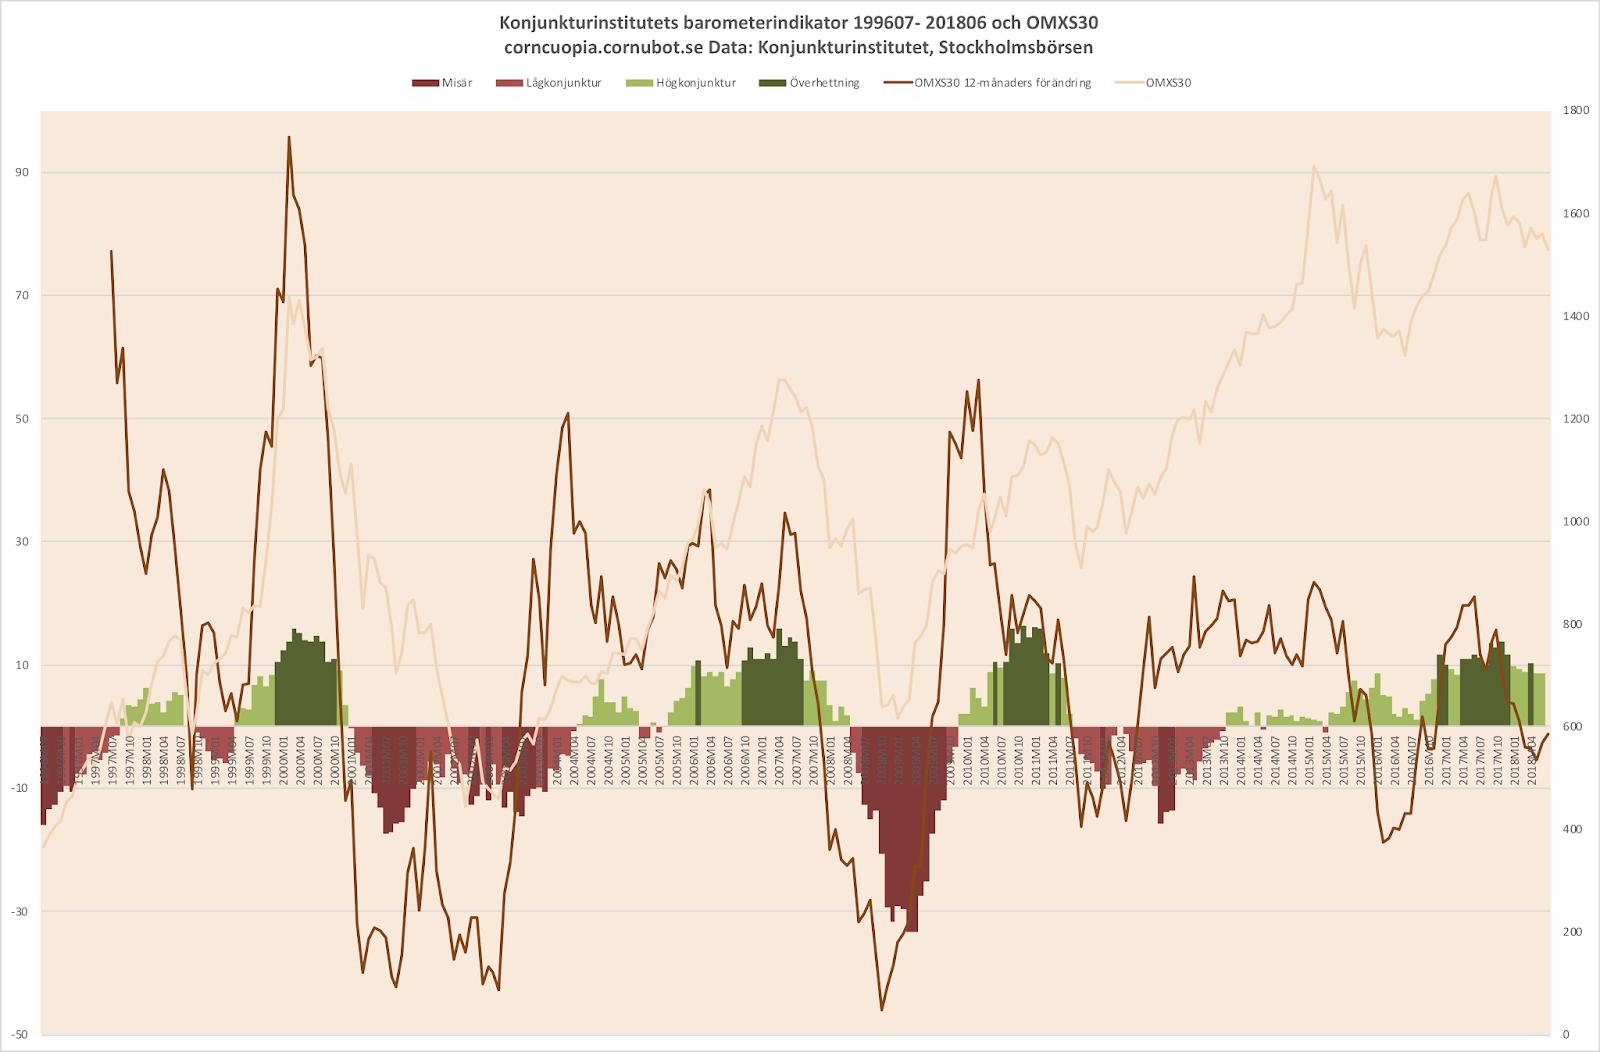 Cornucopia   Graf  Börsen och konjunkturbarometern 0d1937f2893ae